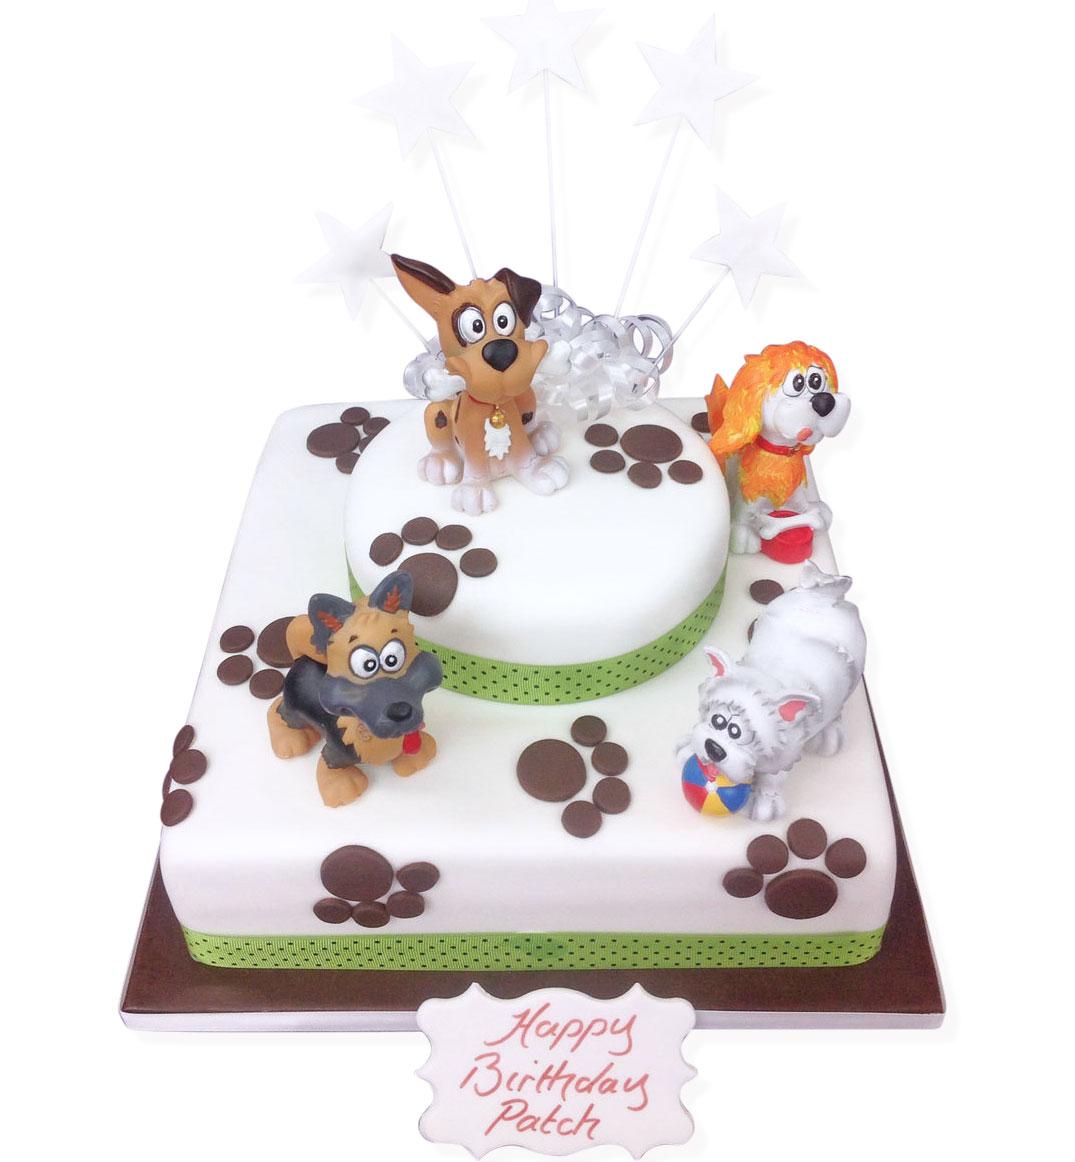 Princess Cake | Luxury Cakes | The Brilliant Bakers